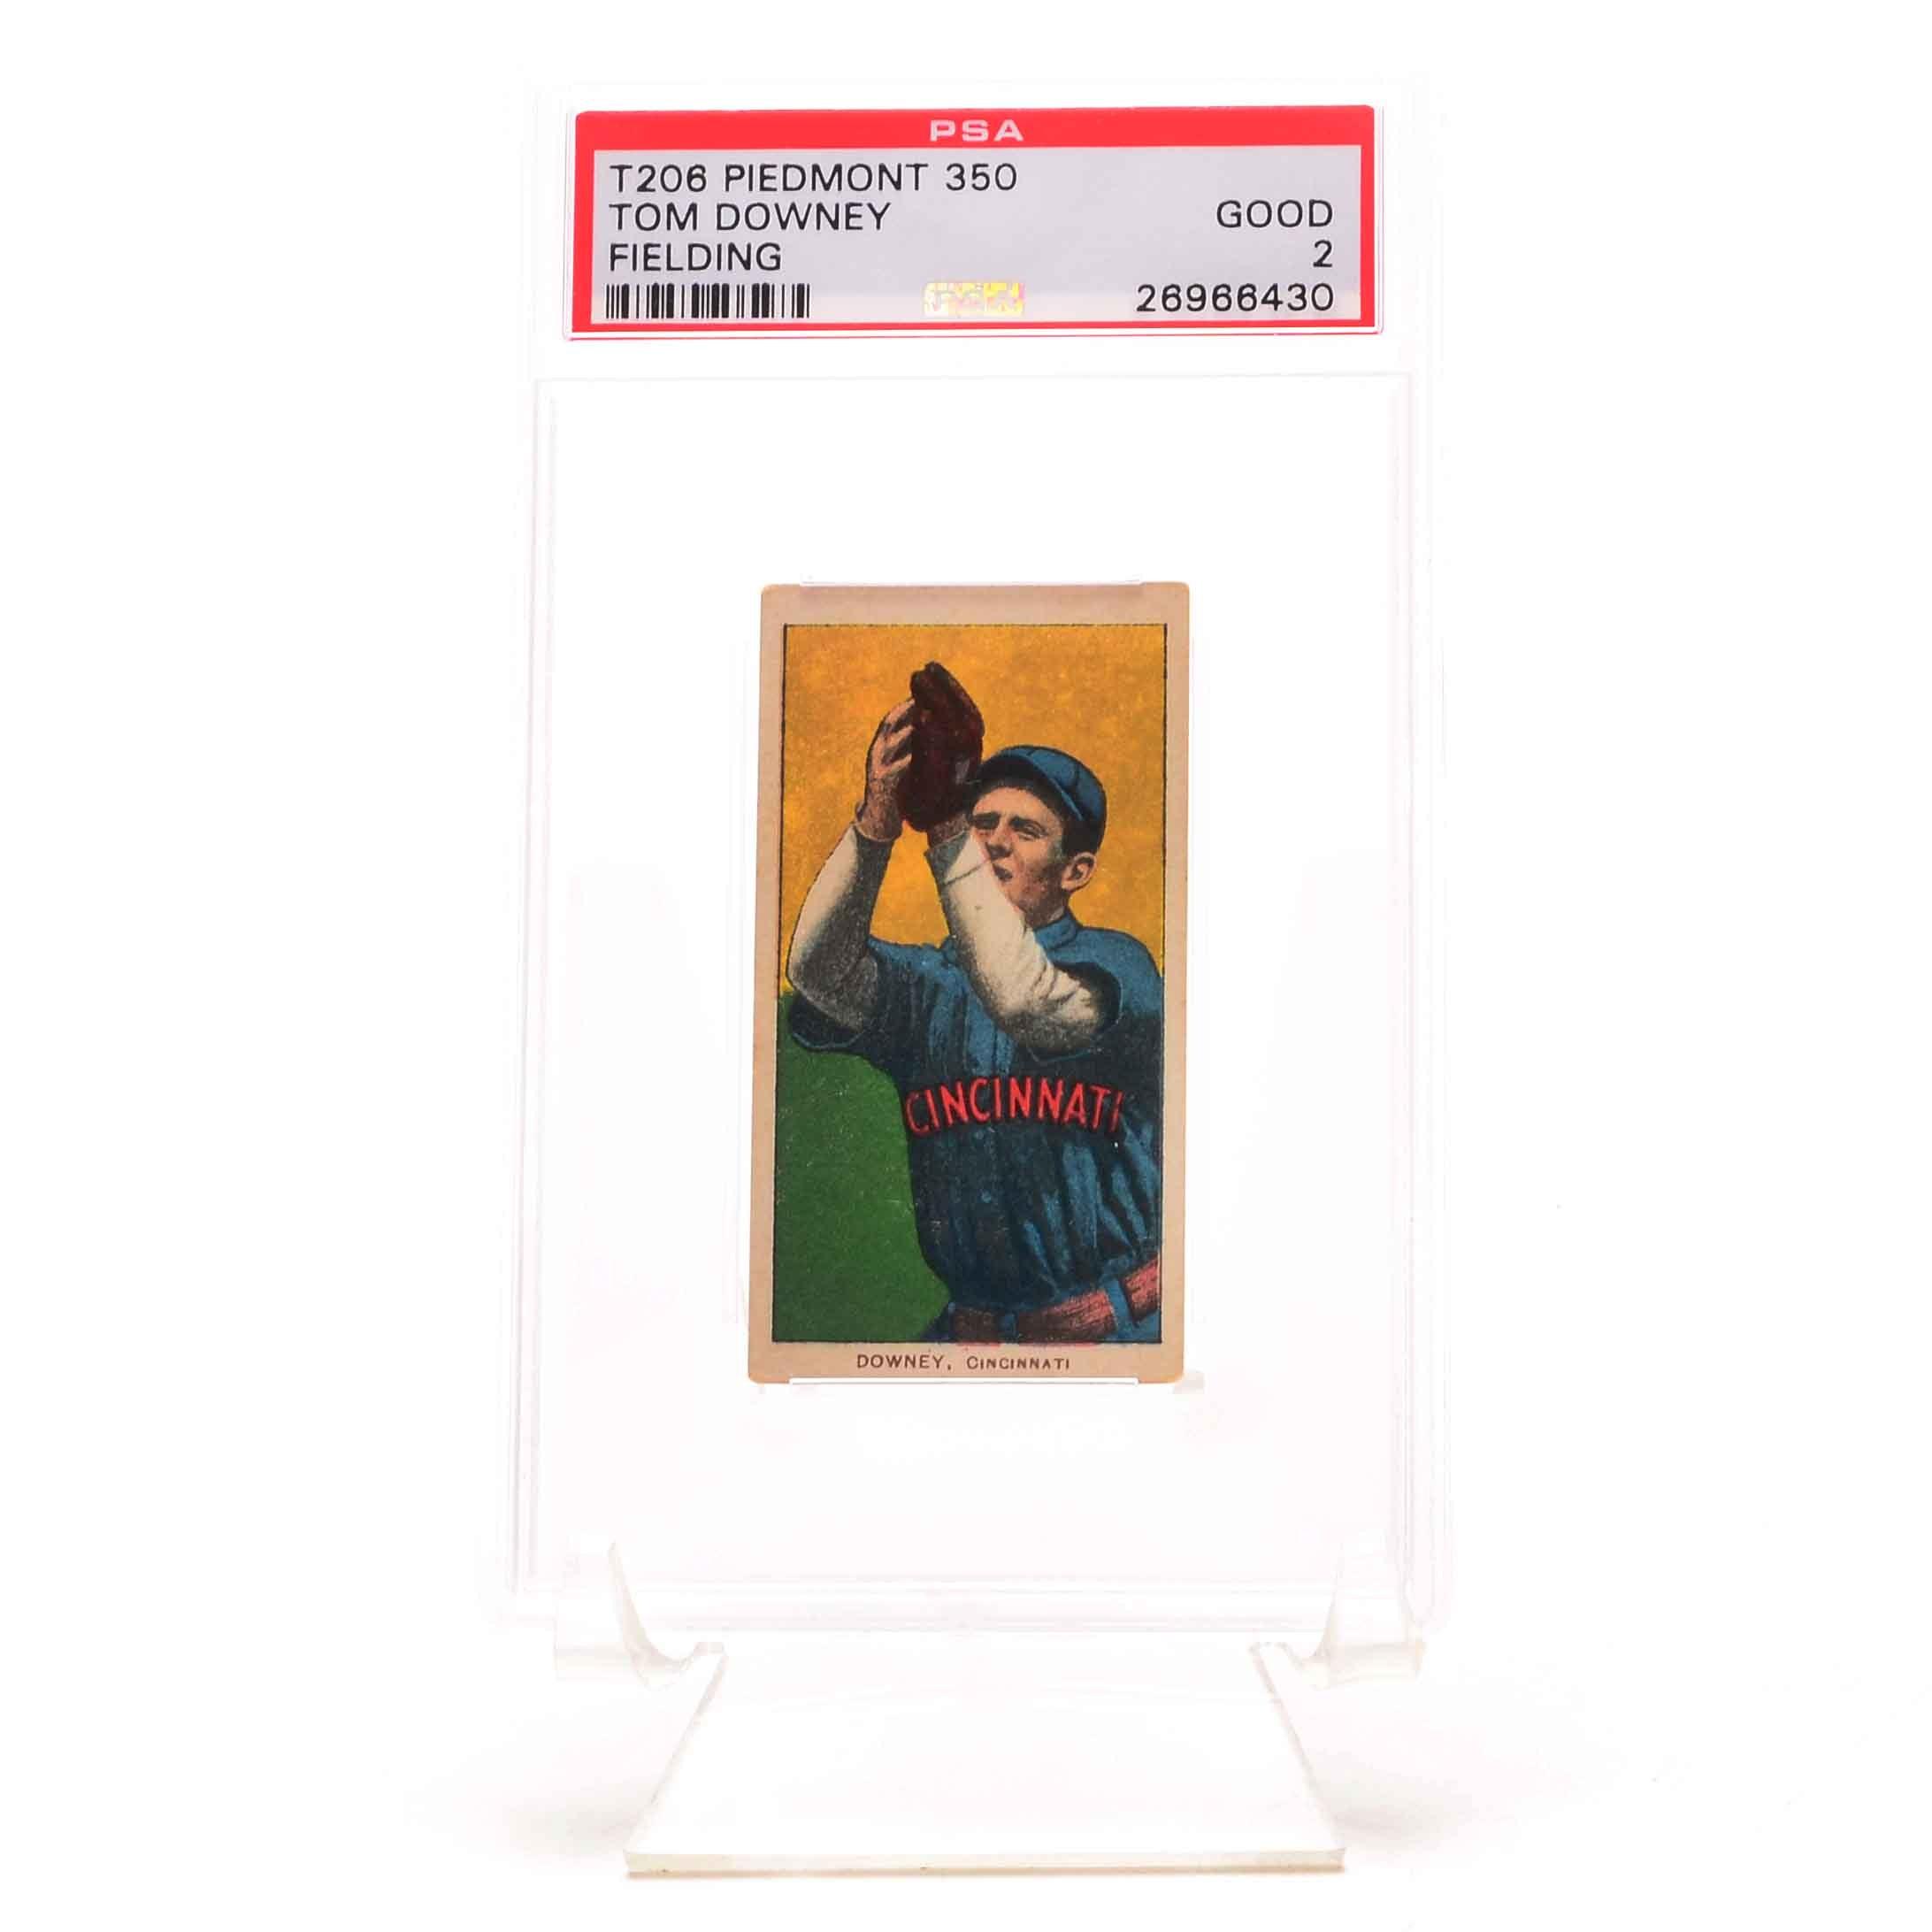 1909-11 Tom Downey  Reds PSA Graded Tobacco Baseball Card